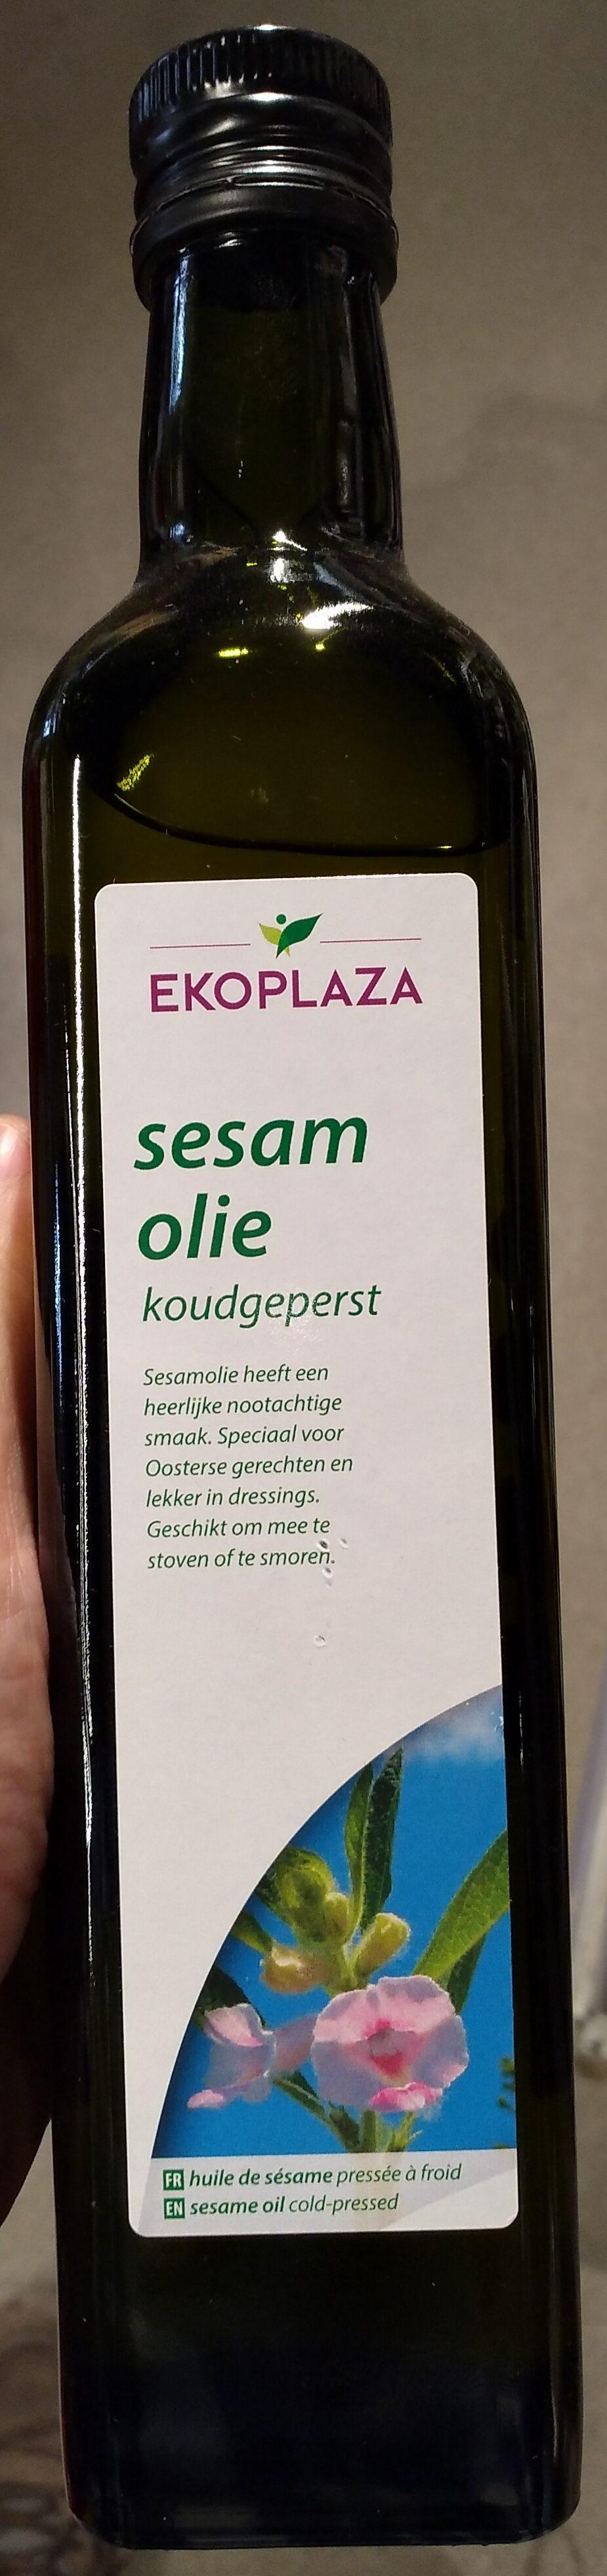 Sesam olie - Product - nl